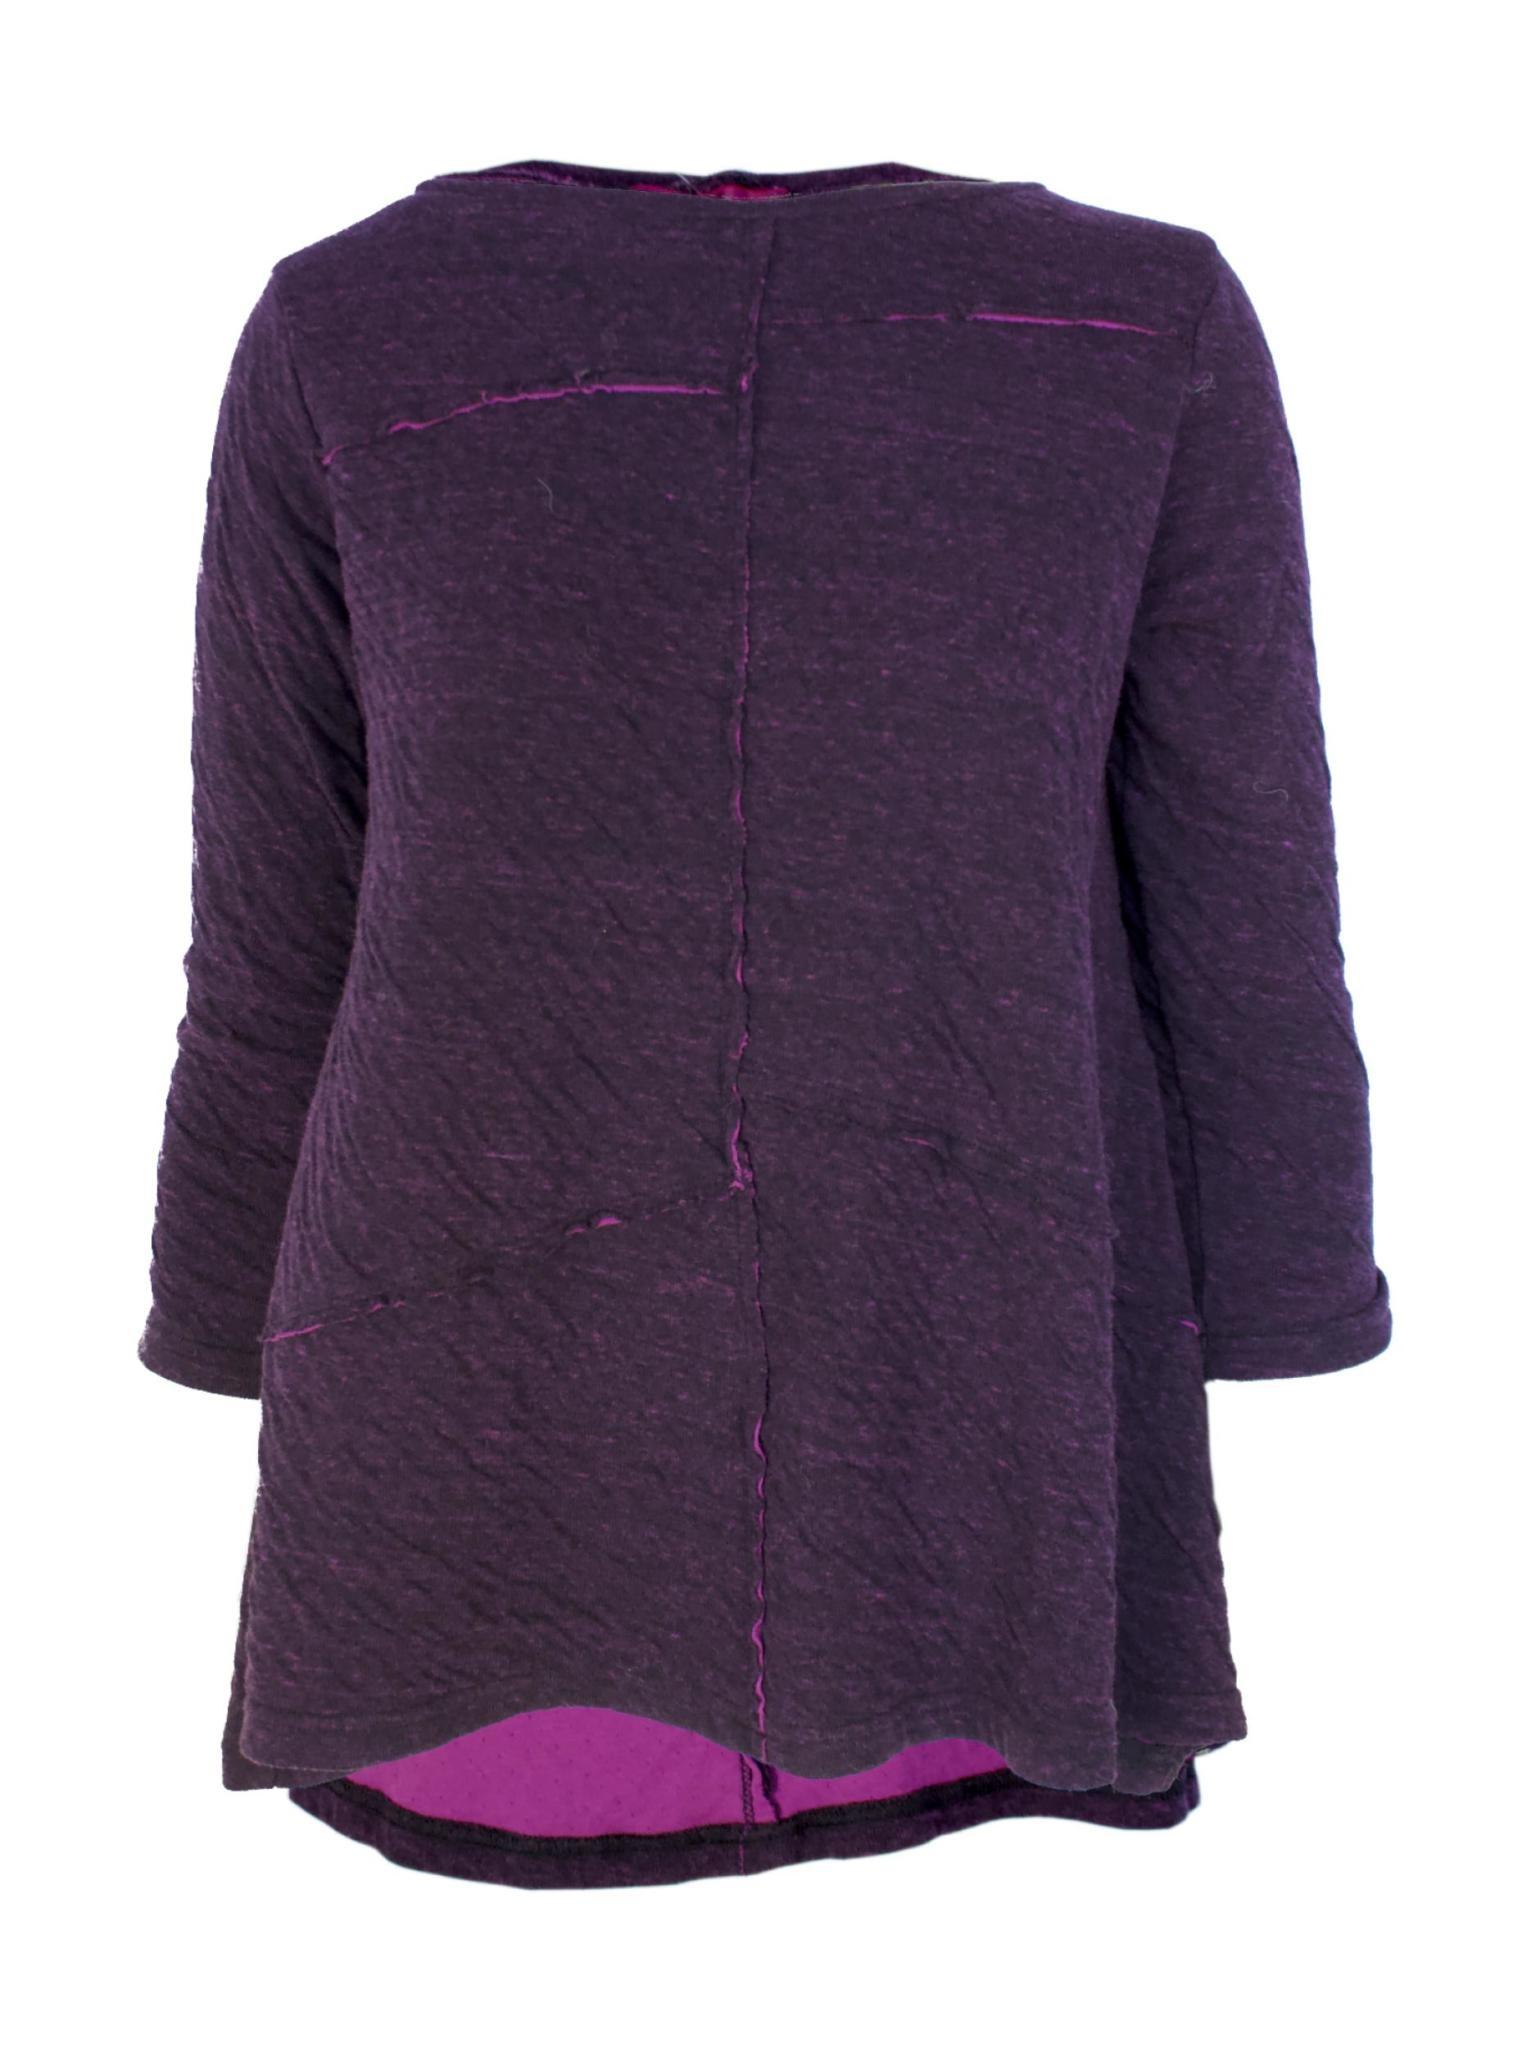 Cut Loose Charcoal Double Cloth Peplum Top